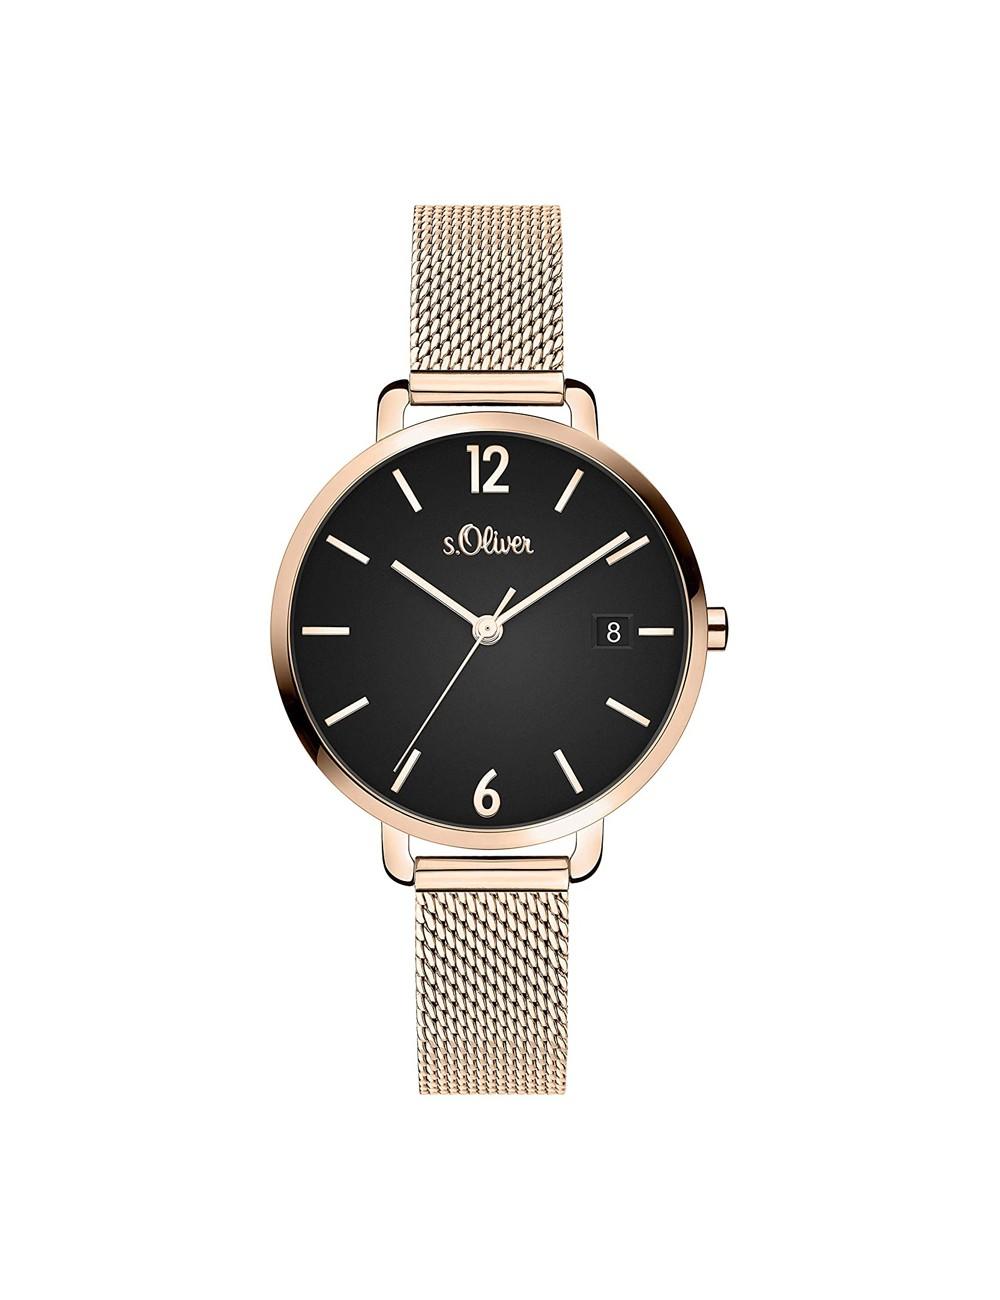 s.Oliver SO-4084-MQ Ladies Watch